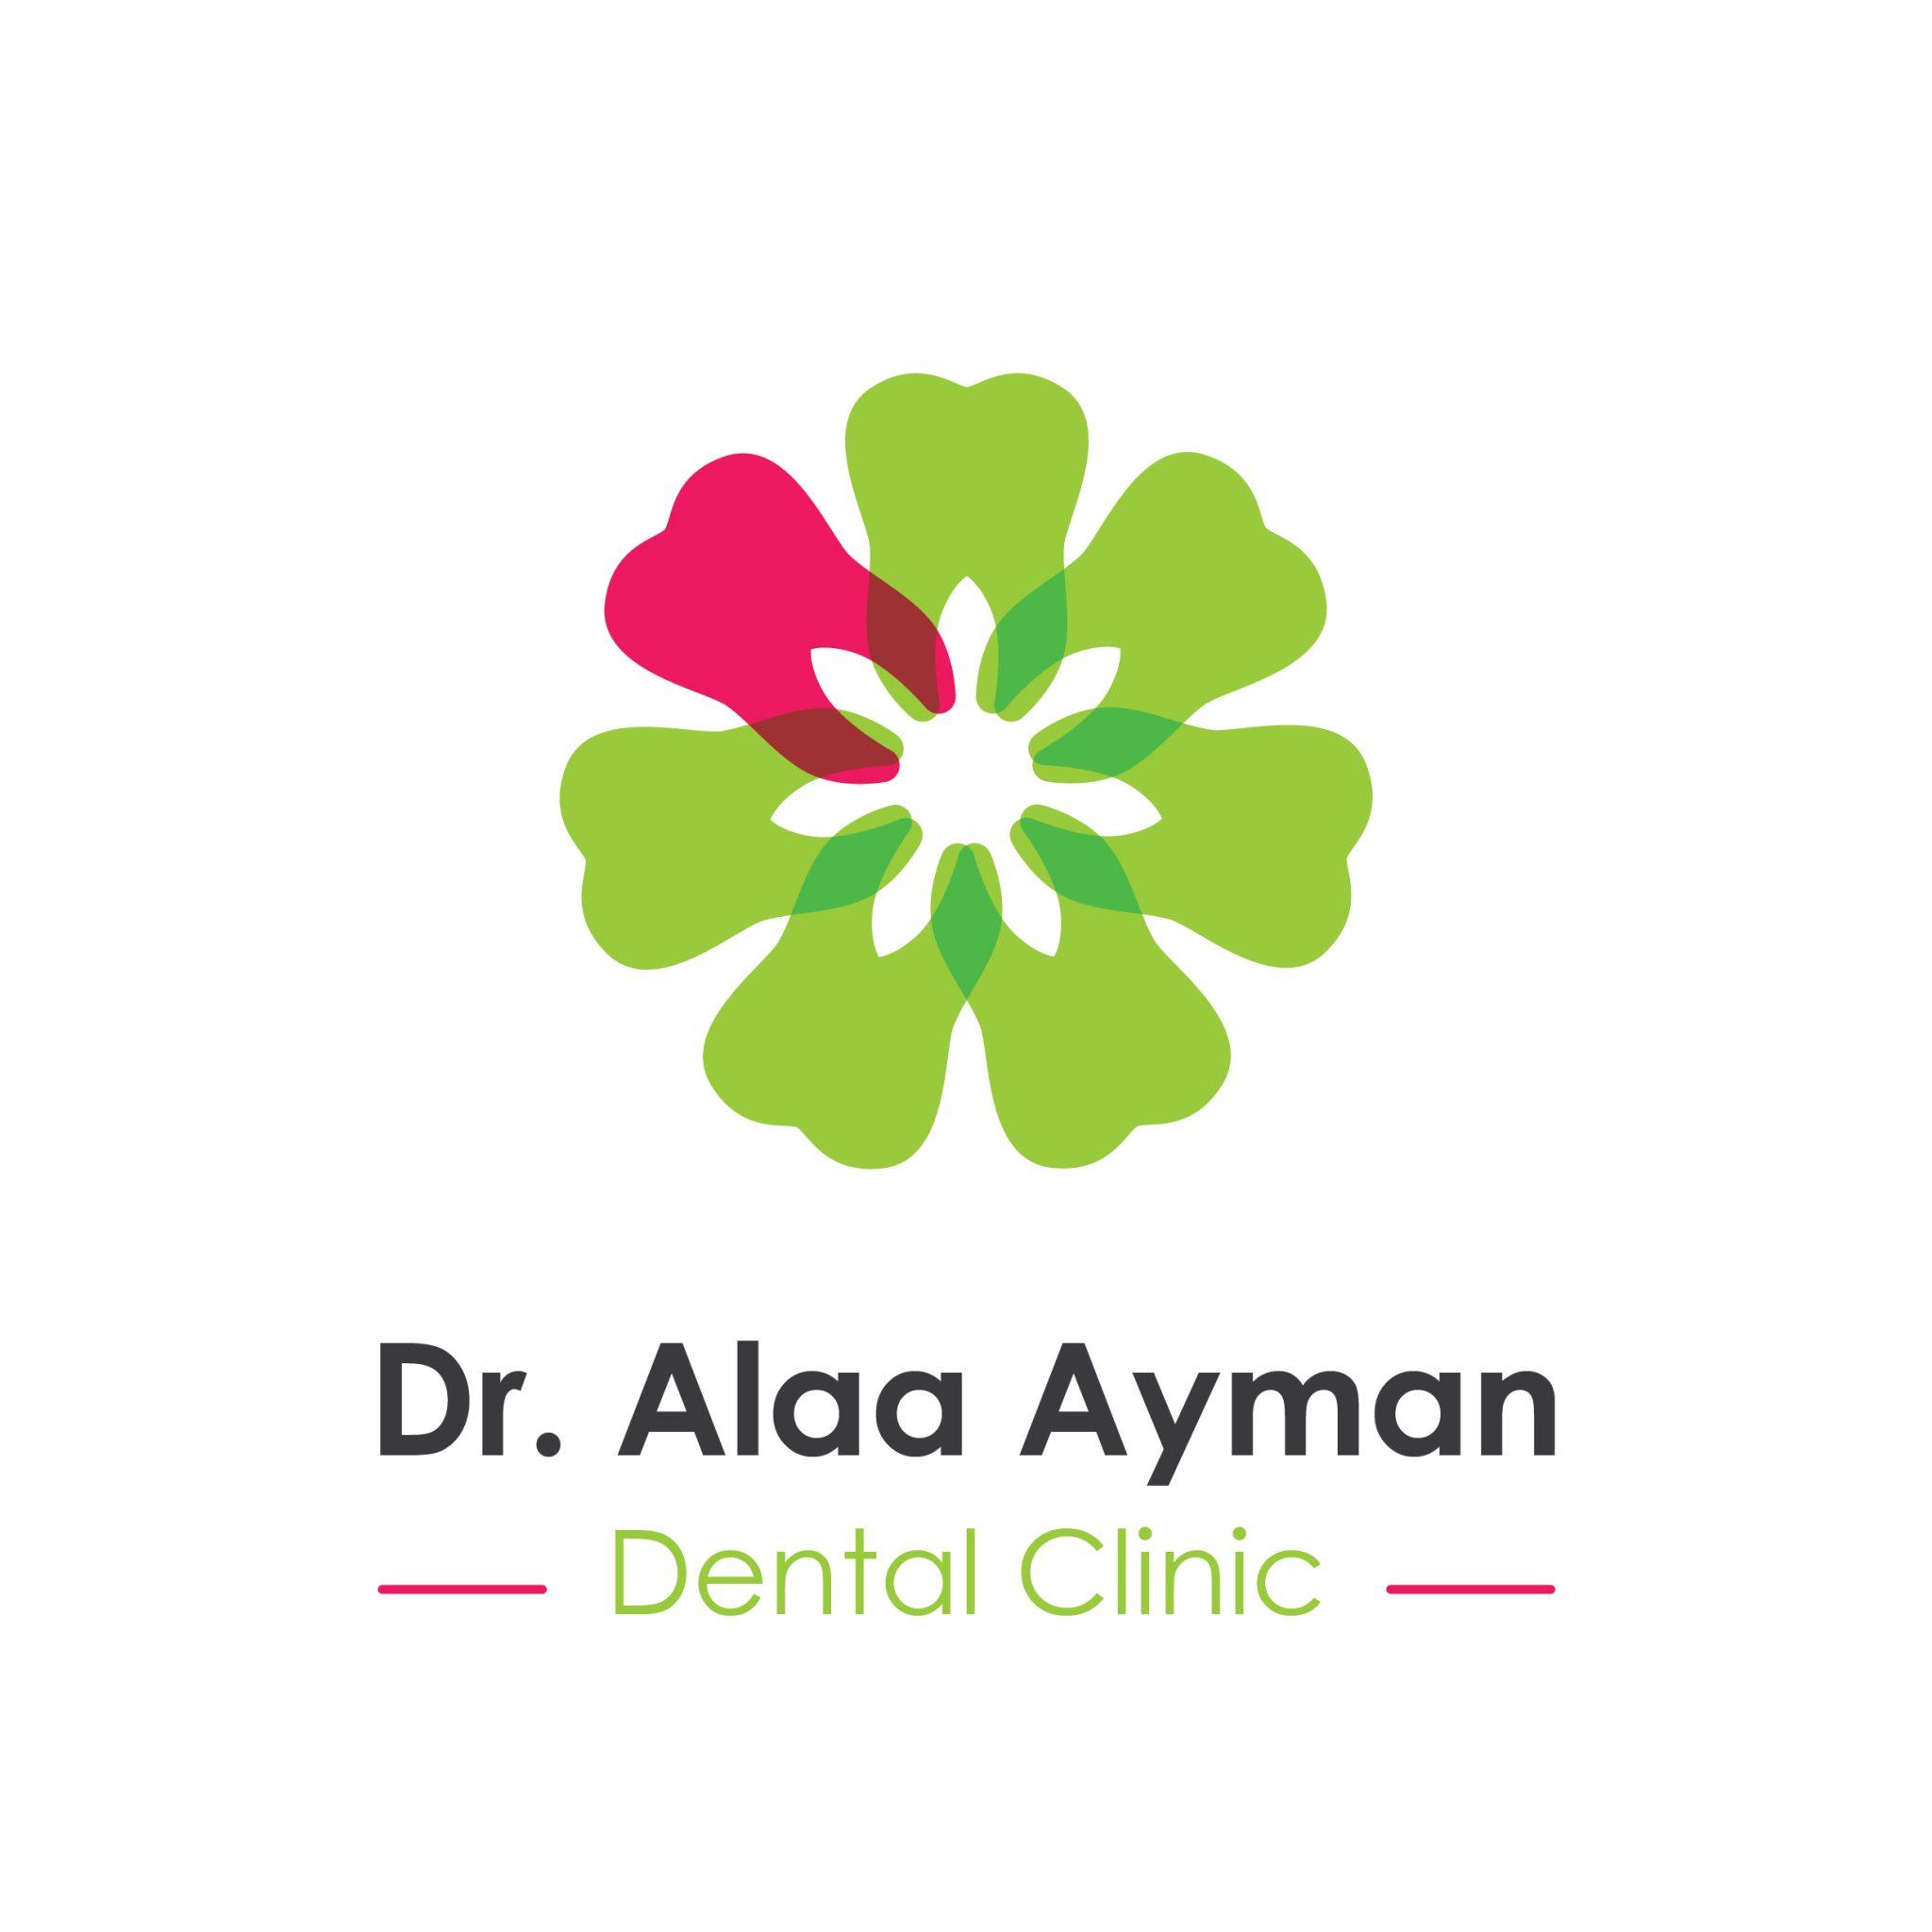 Dr. Alaa Ayman logo